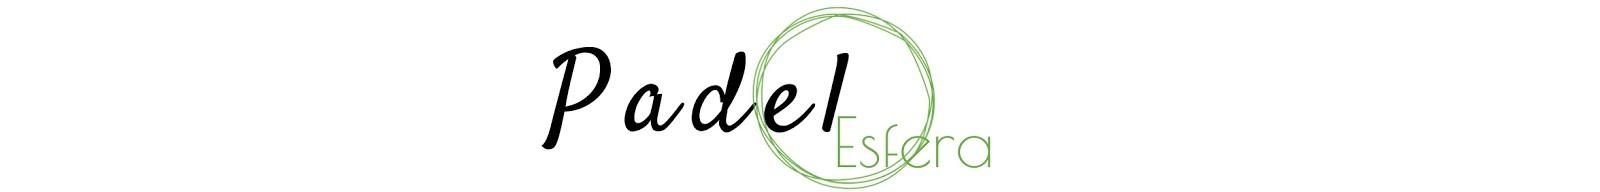 Padel Esfera